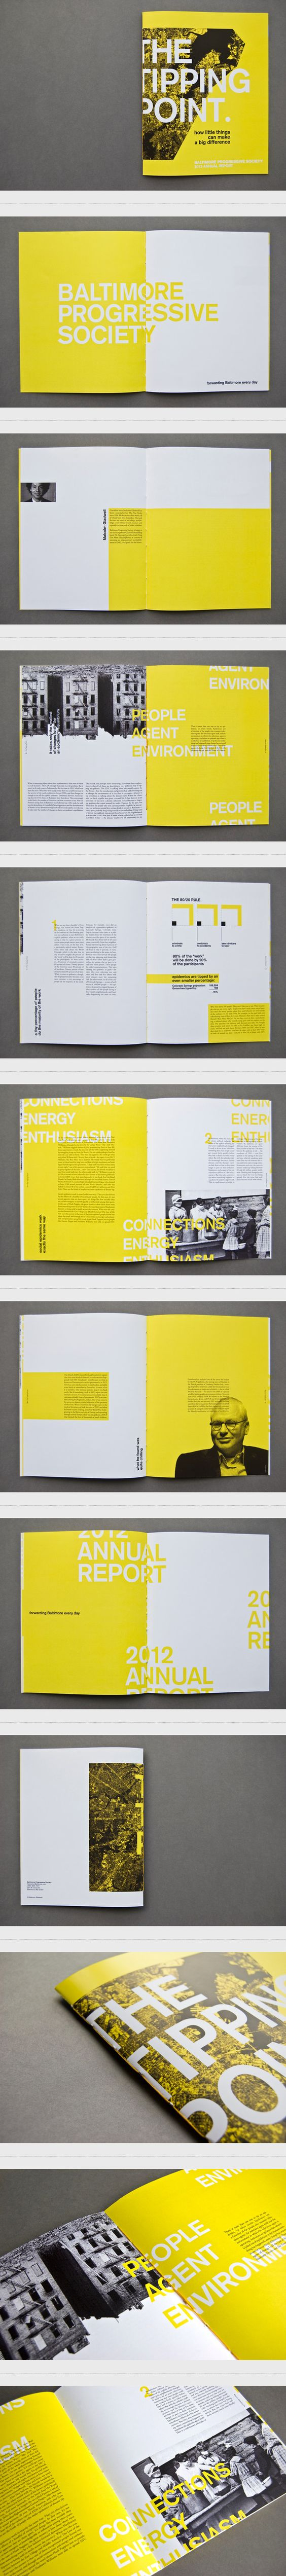 2 colores, un audaz amarillo y un negro acompañante // The Tipping Point: Annual Report